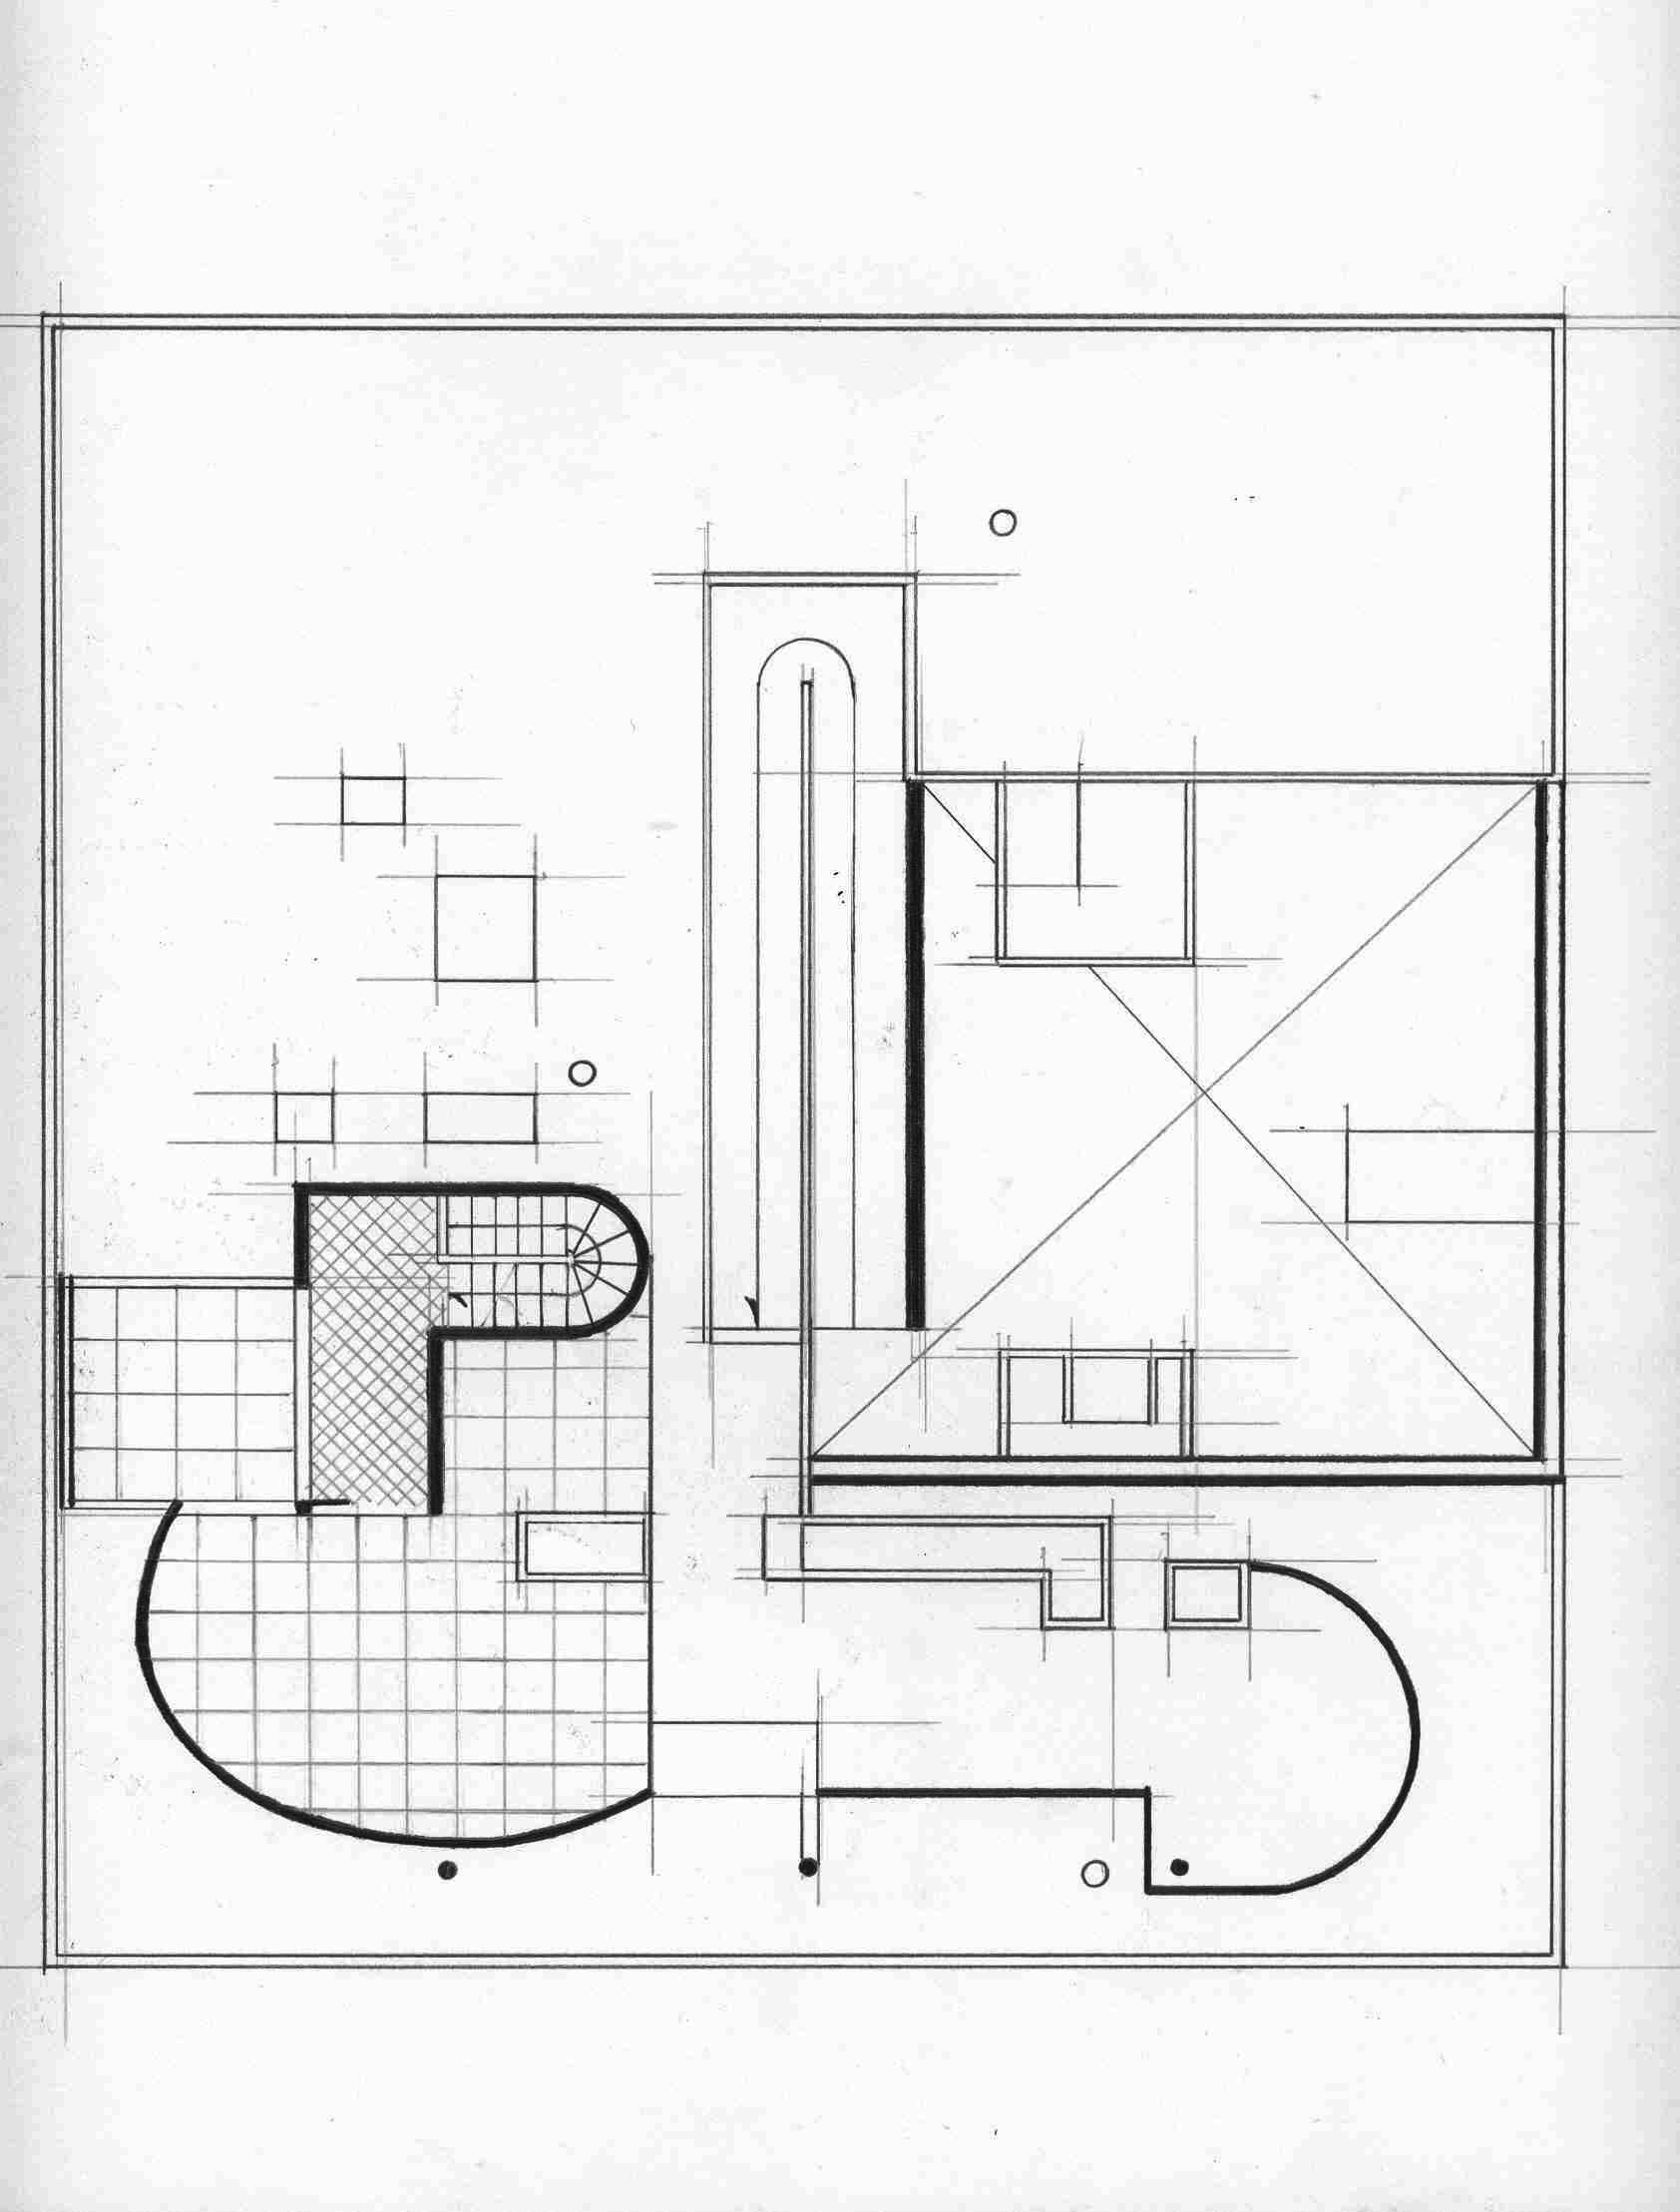 Villa Savoye Dimensions Villa savoye  amp  small houseVilla Savoye 2nd Floor Plan